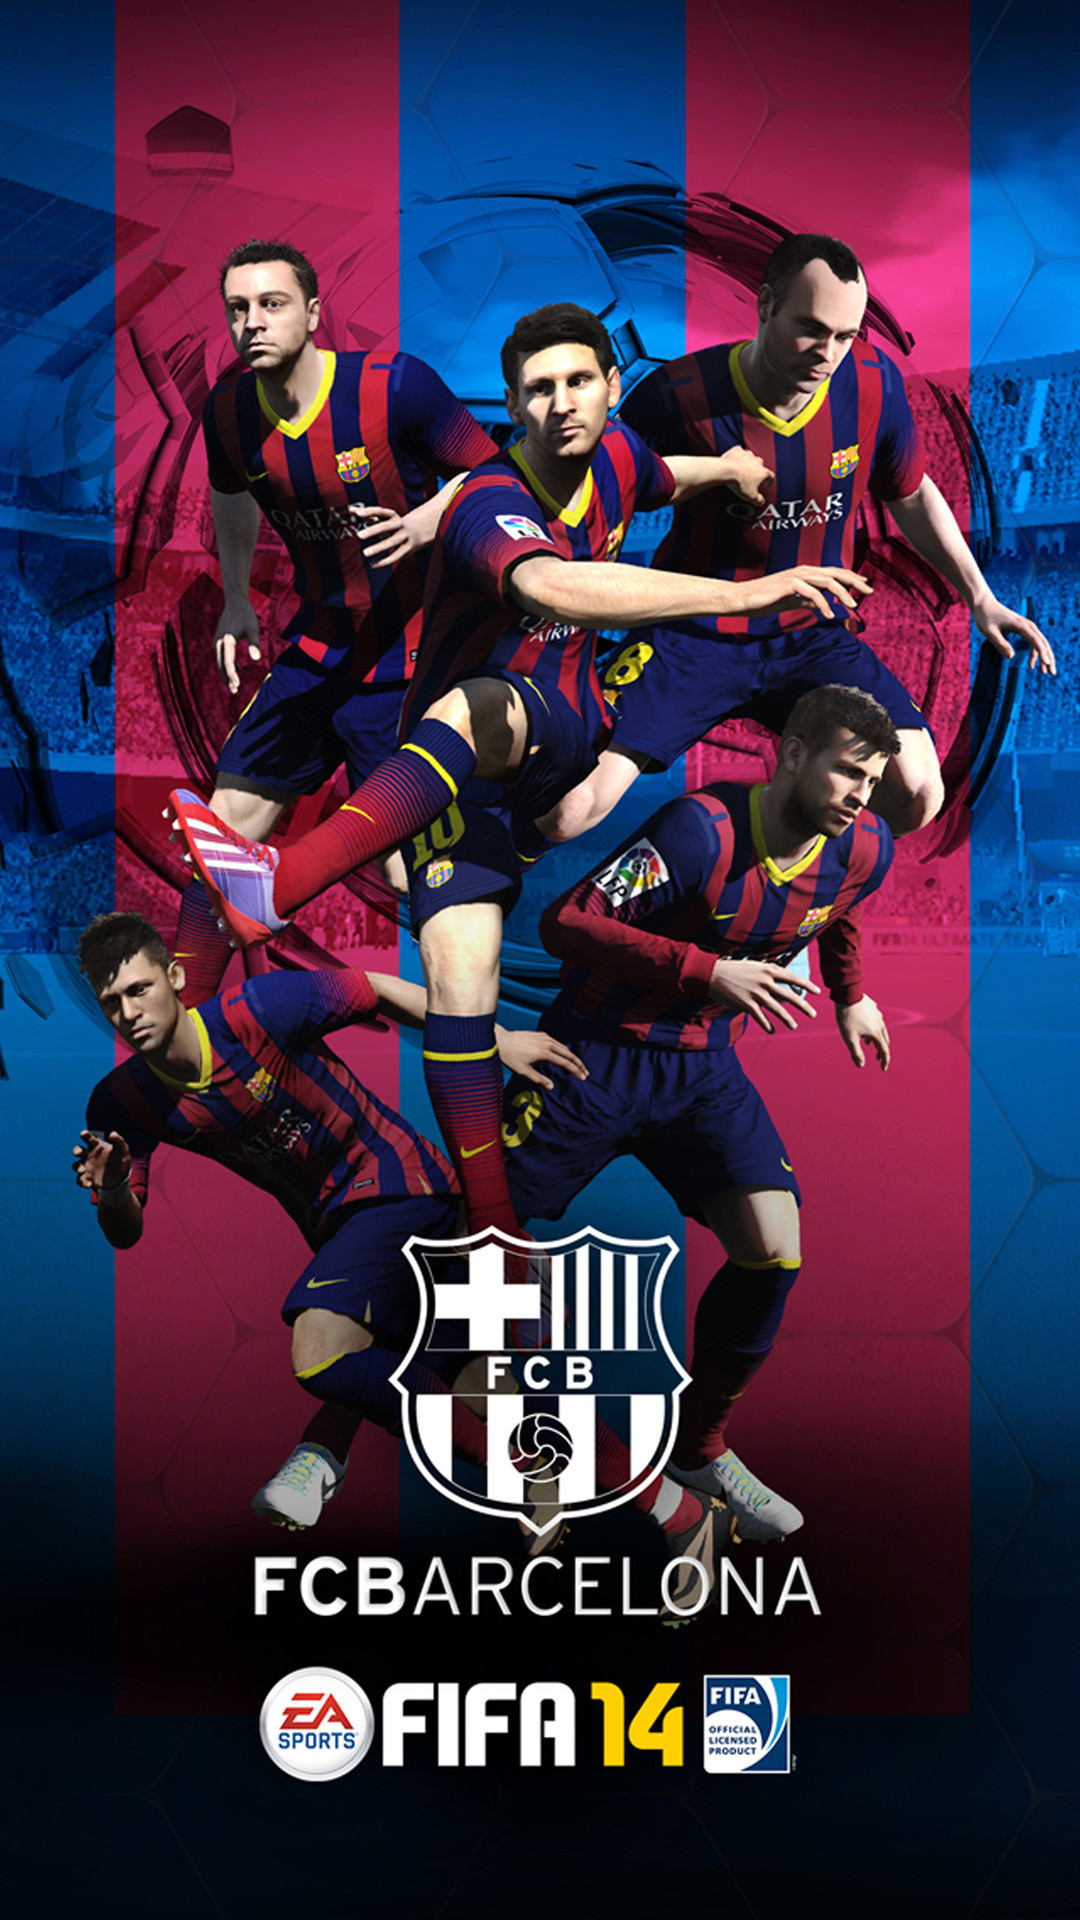 iPhone 6 plus FIFA 14 Barcelona HD Wallpaper